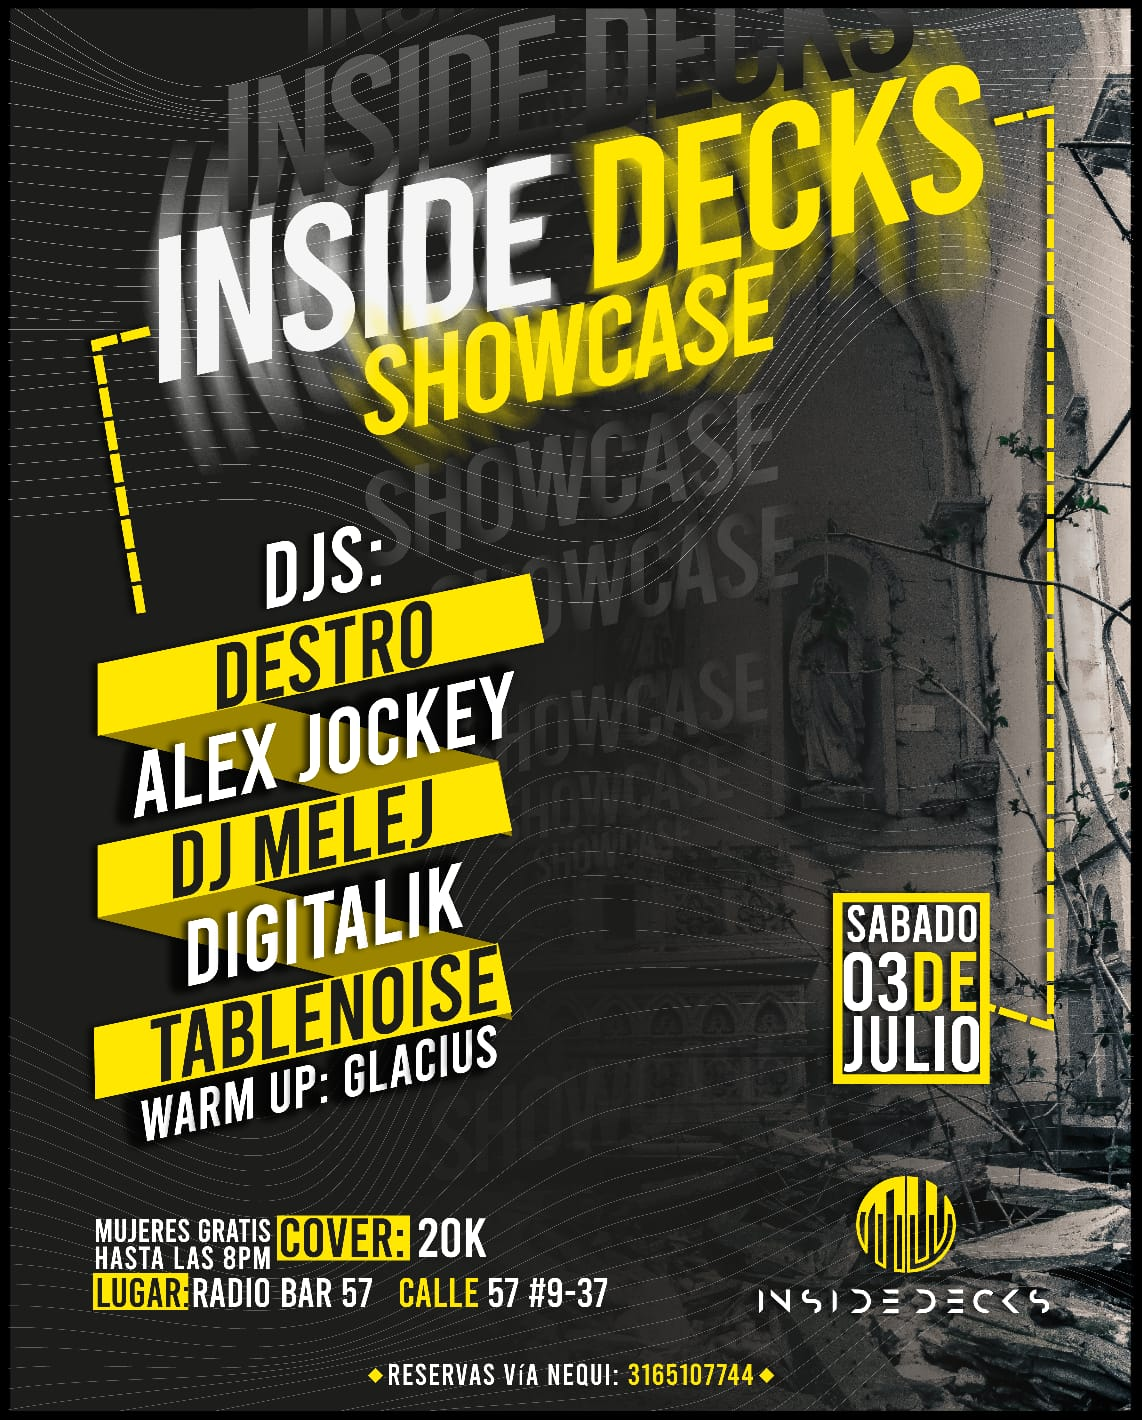 INSIDE DECKS Showcase